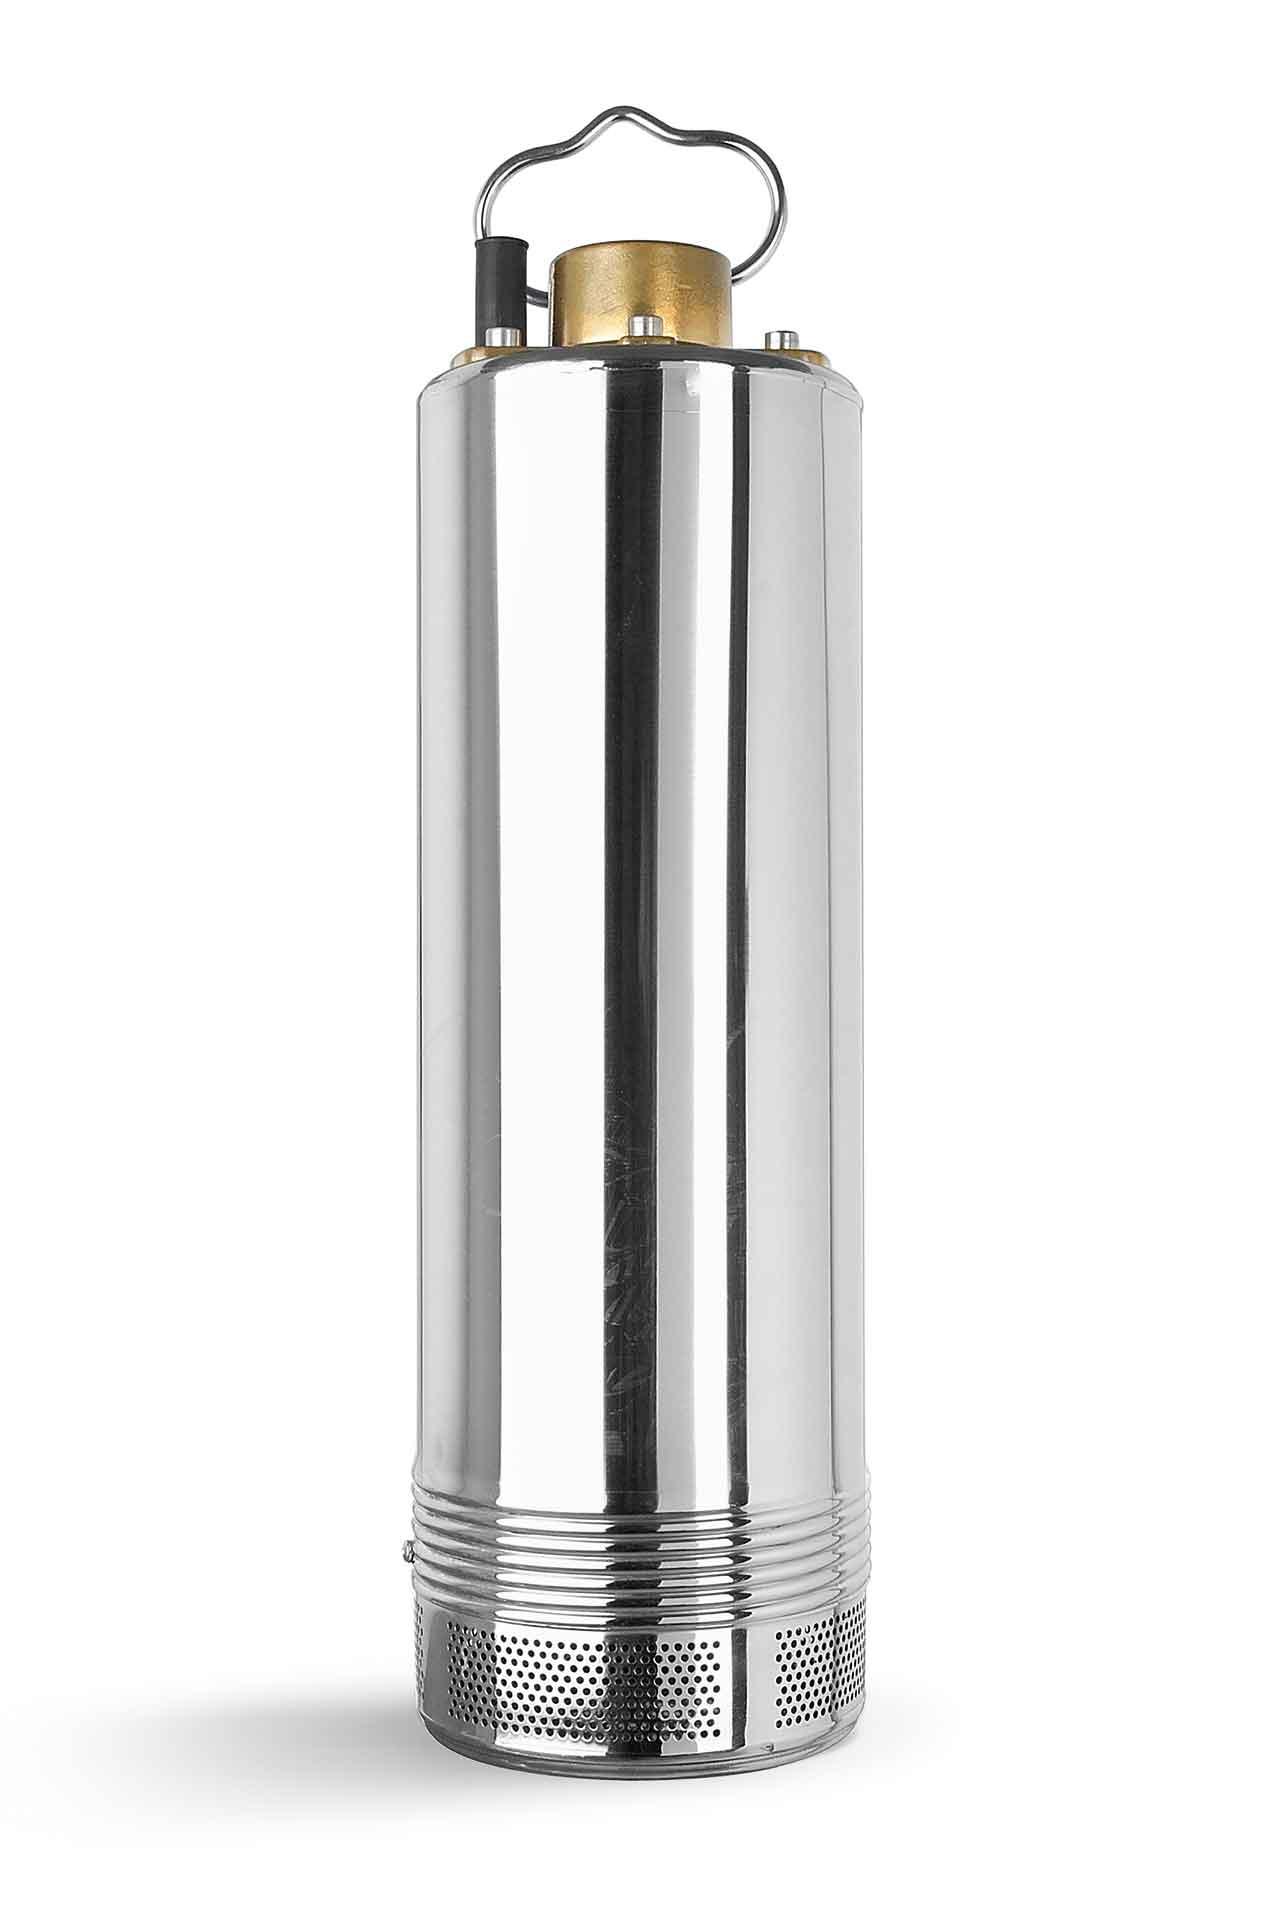 Pompe submersibile SRM-SRT seria /100; Qmax = 6 m3/h; Hmax = 75 m